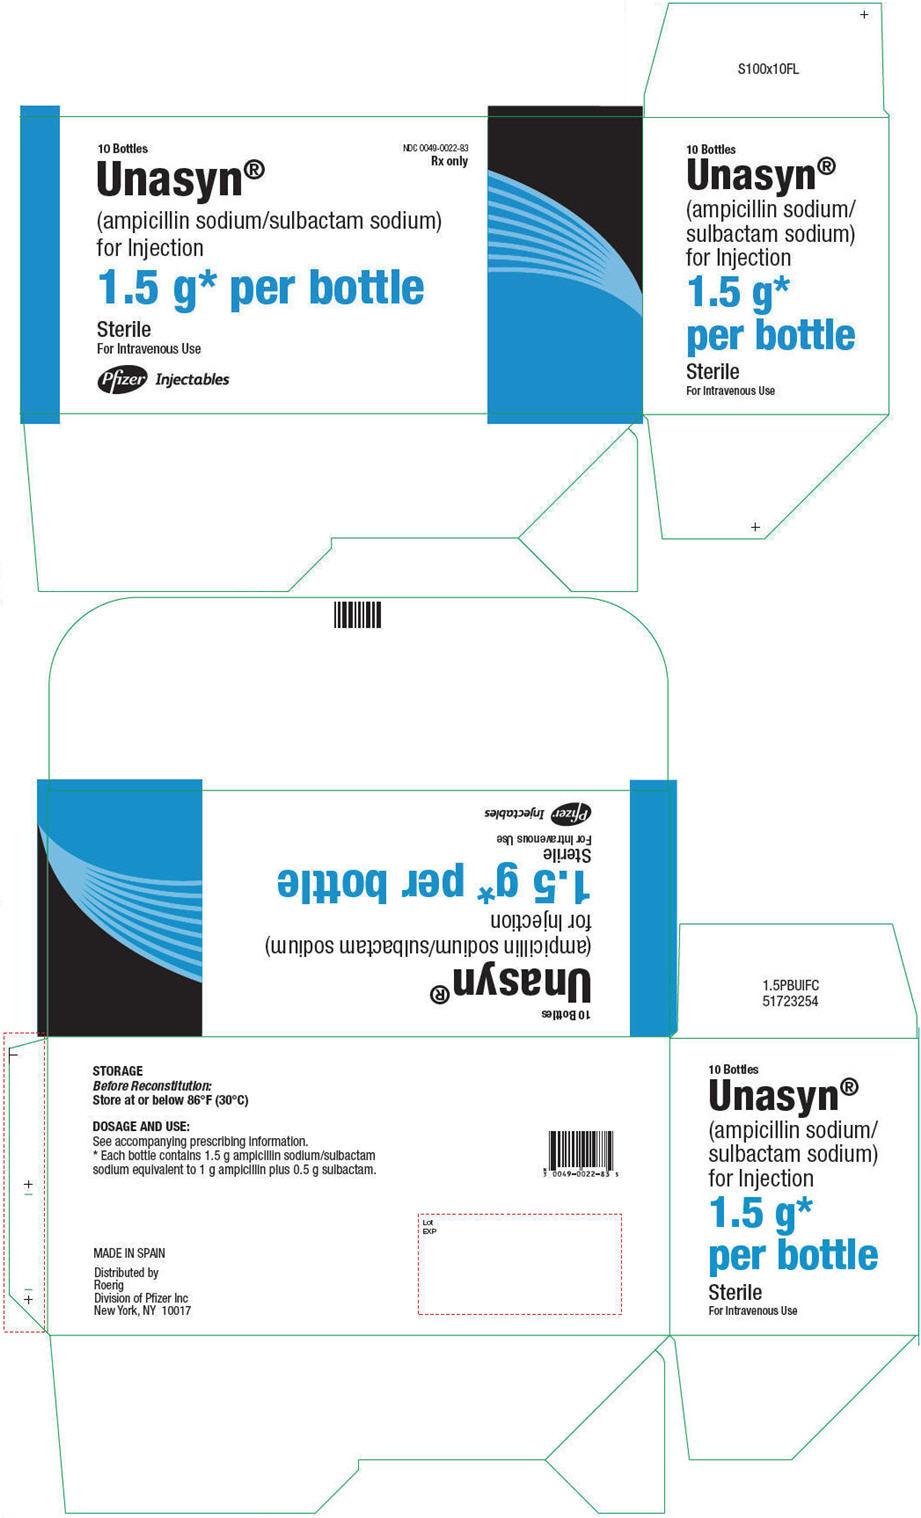 PRINCIPAL DISPLAY PANEL - 10 x 1.5 g Bottle Carton